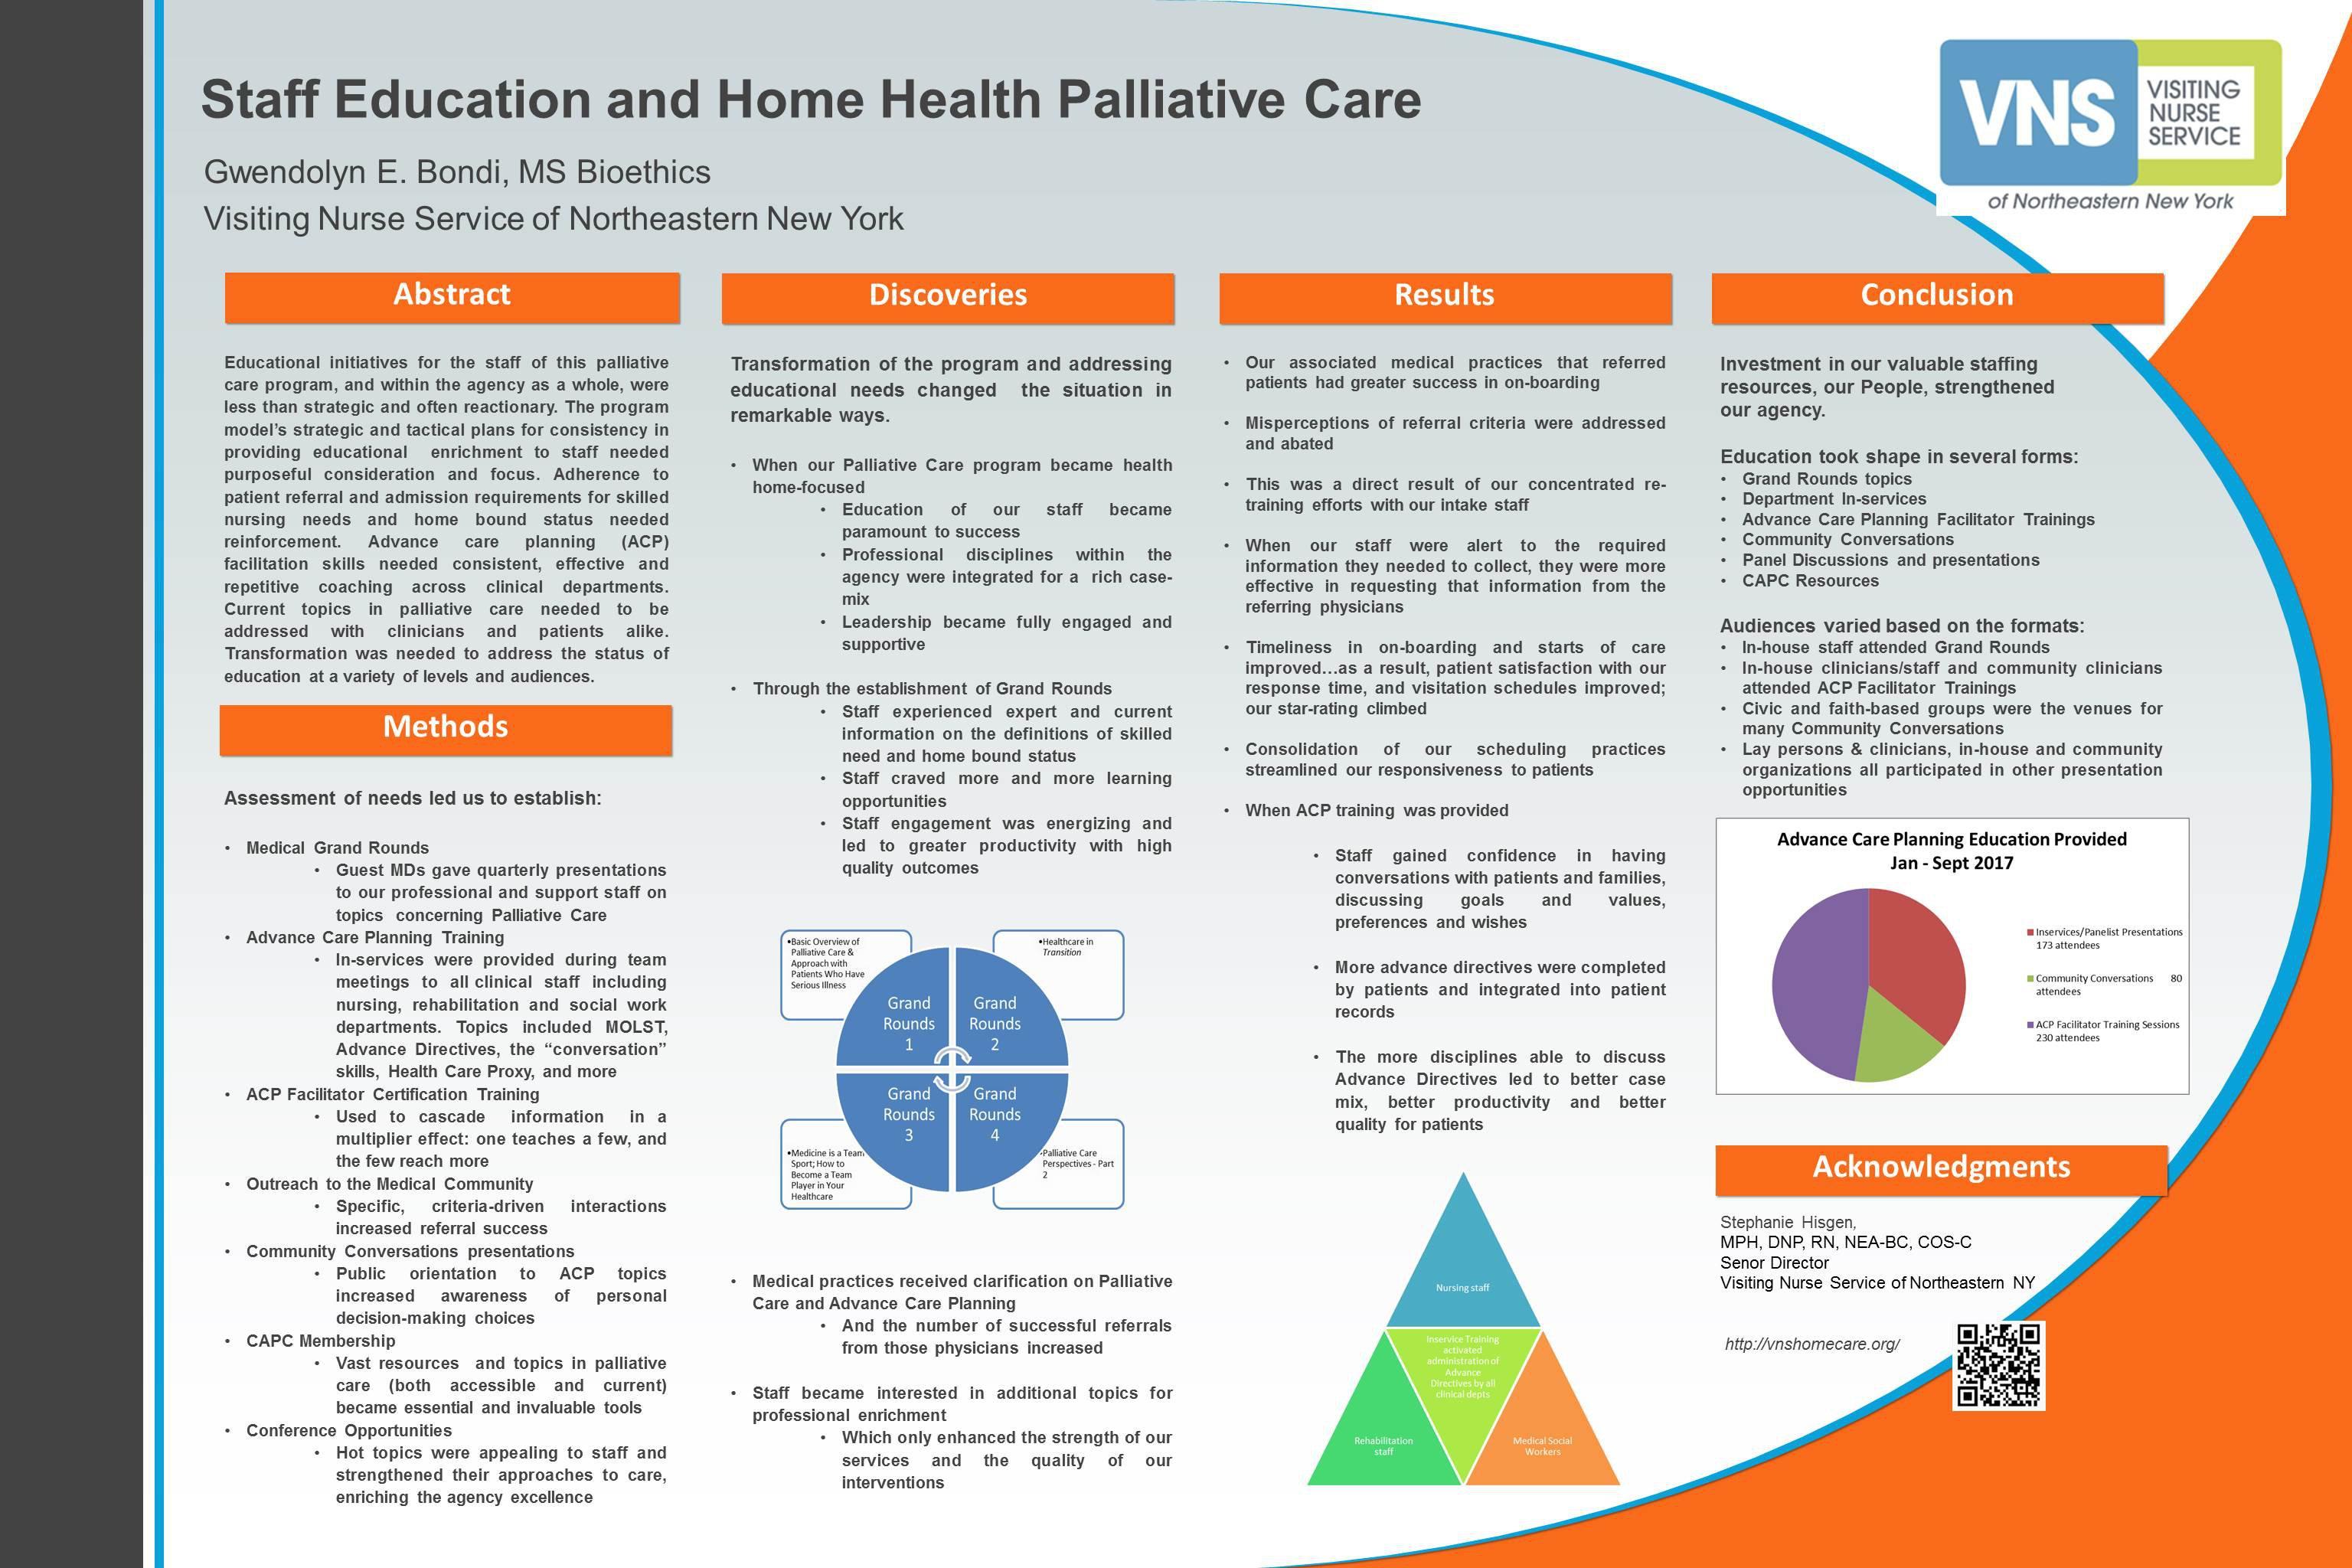 Visiting Nurse Service of NE NY_Staff Education  Home Health Palliative Care BEST 36x24 G.jpg